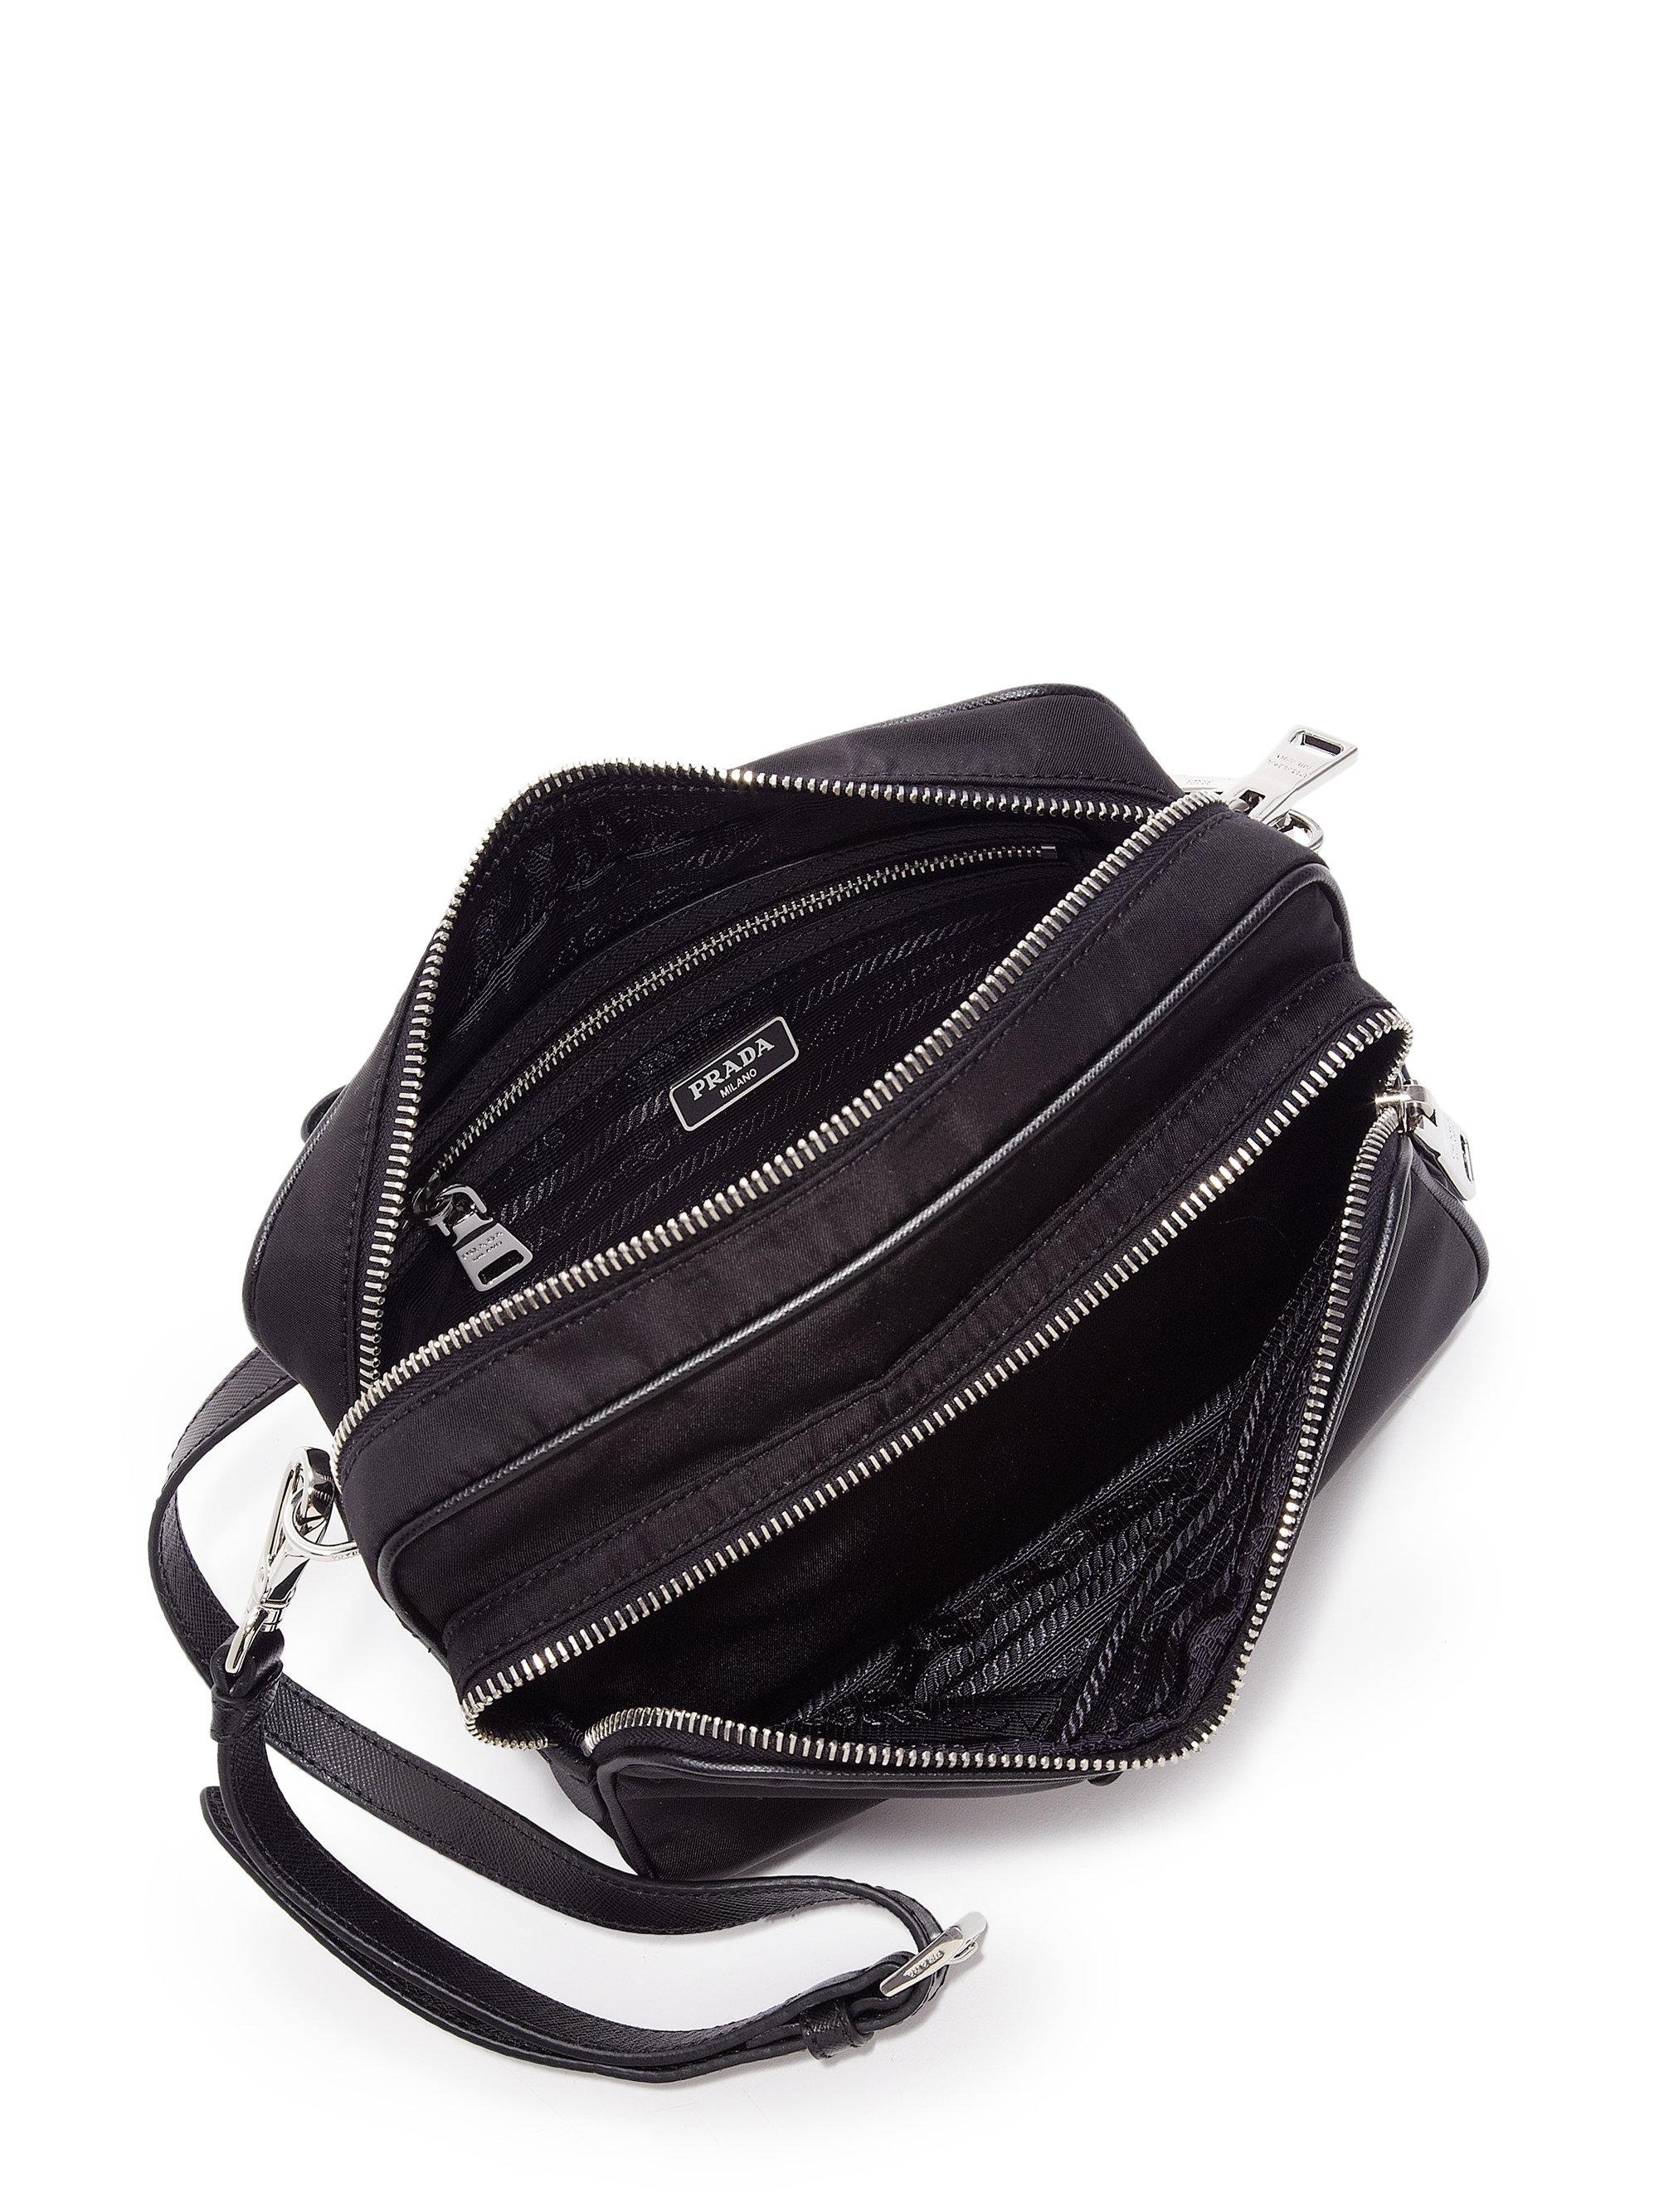 936c62f94100 Lyst - Prada Nylon Double-zip Camera Bag in Black